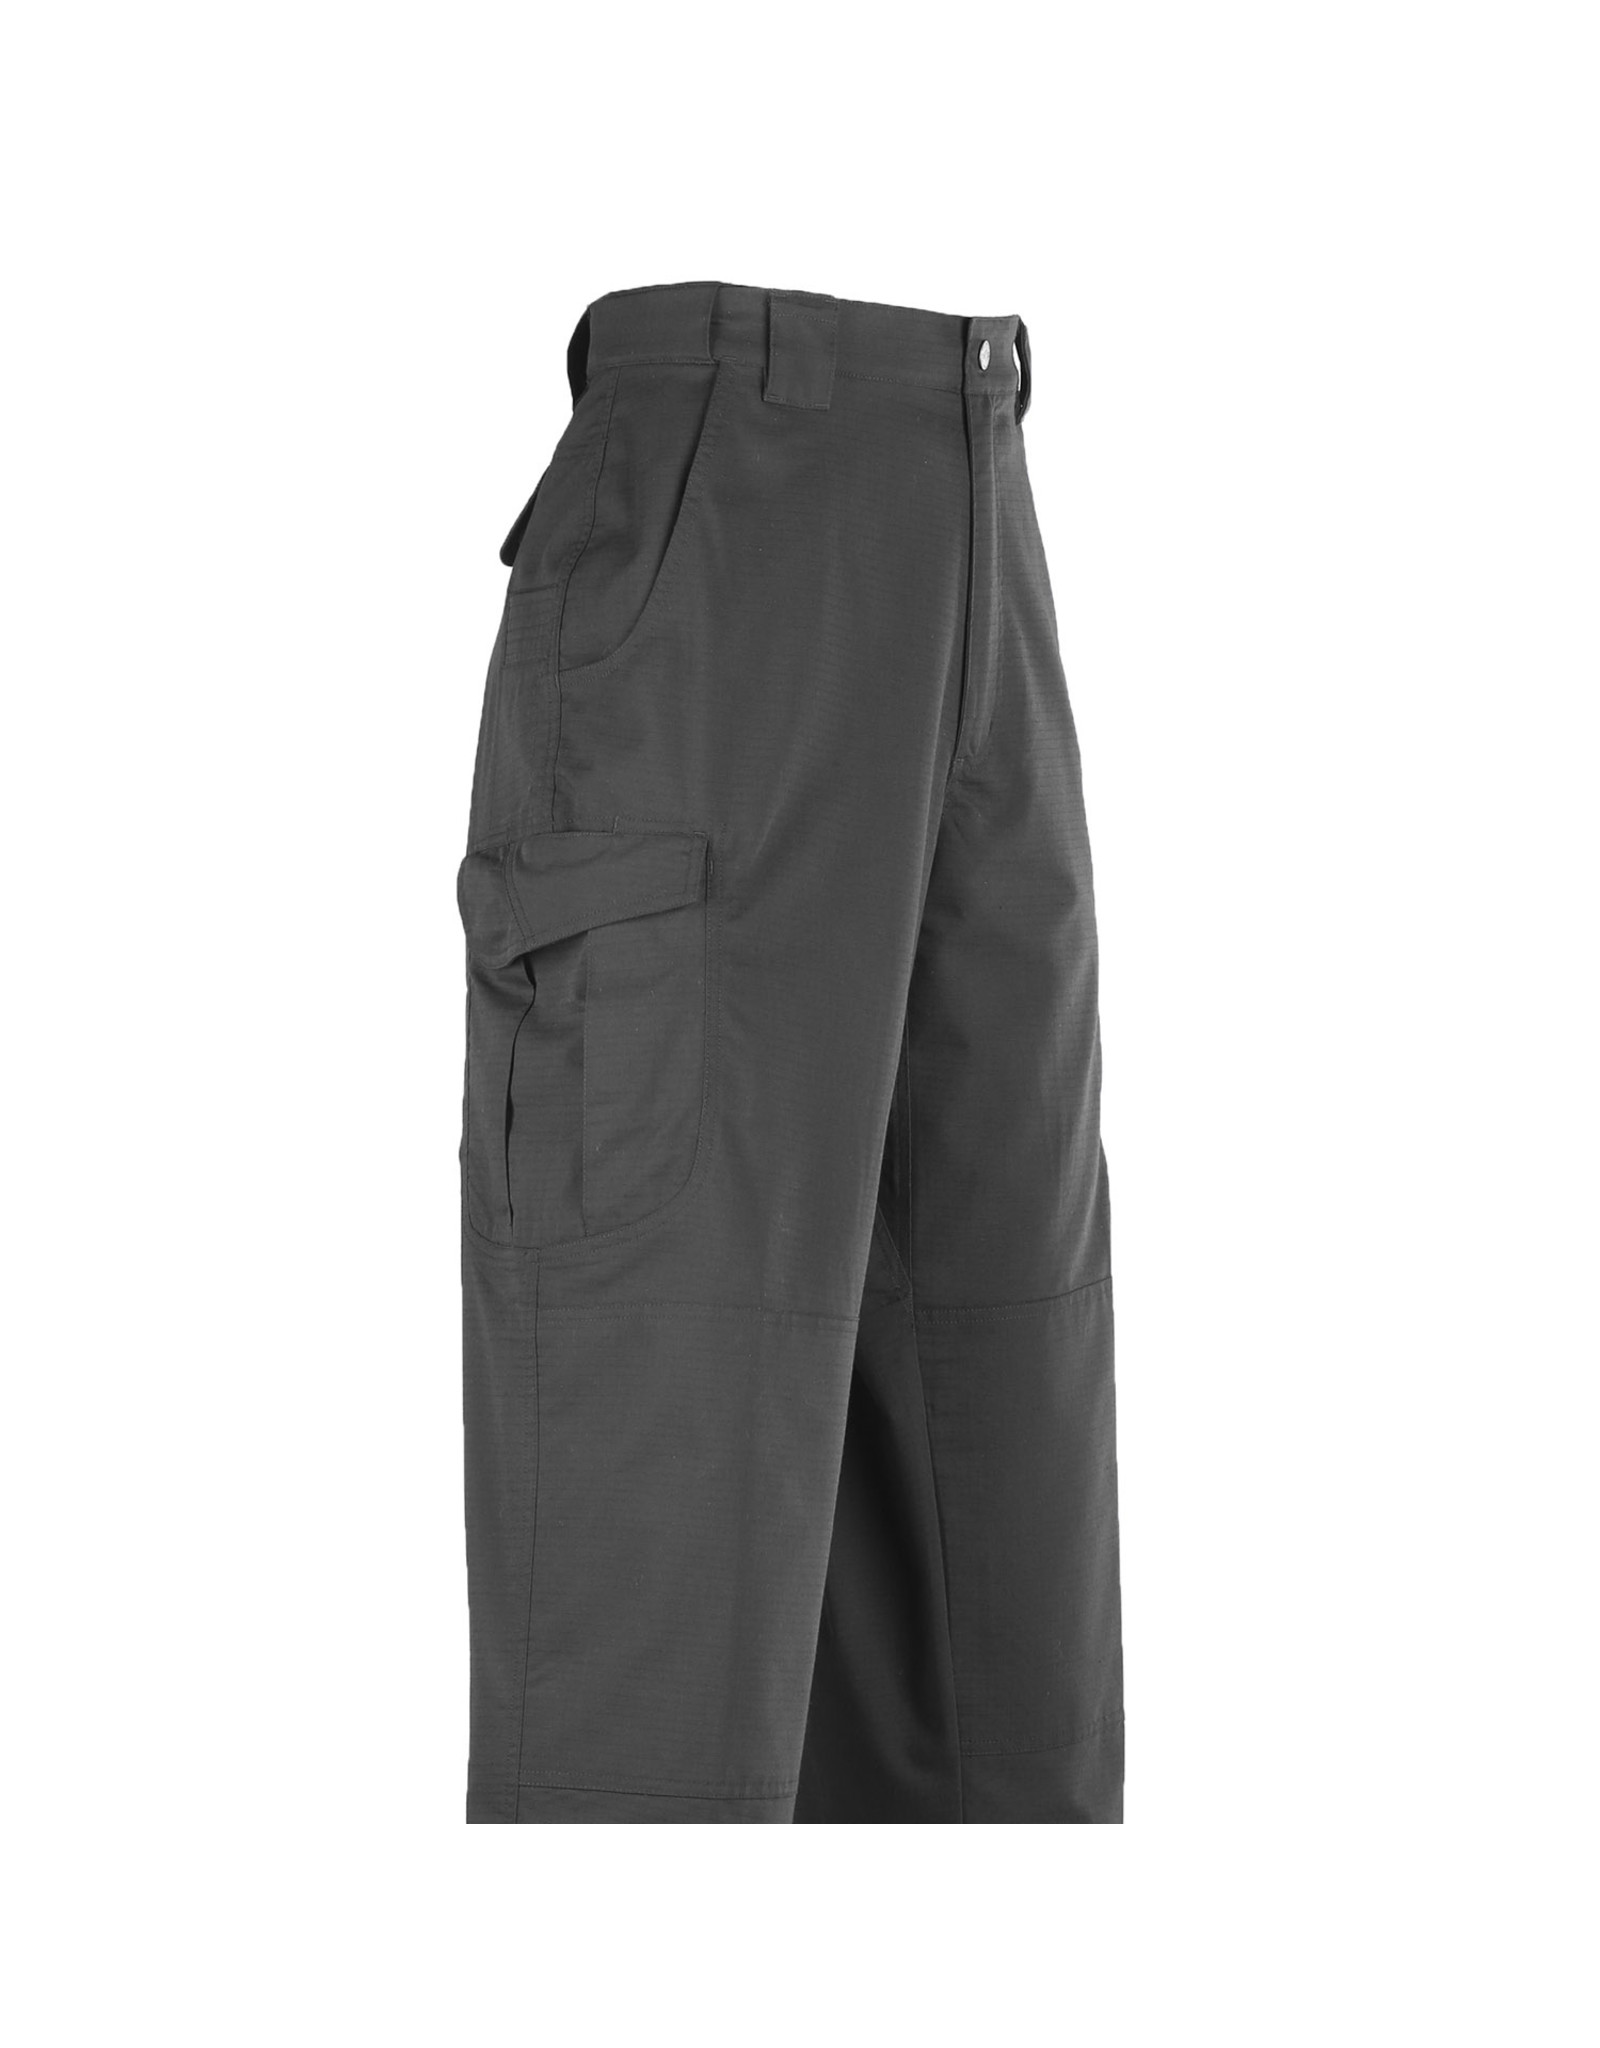 TRU-SPEC Men's 24/7 ascent pant (34 inseam)